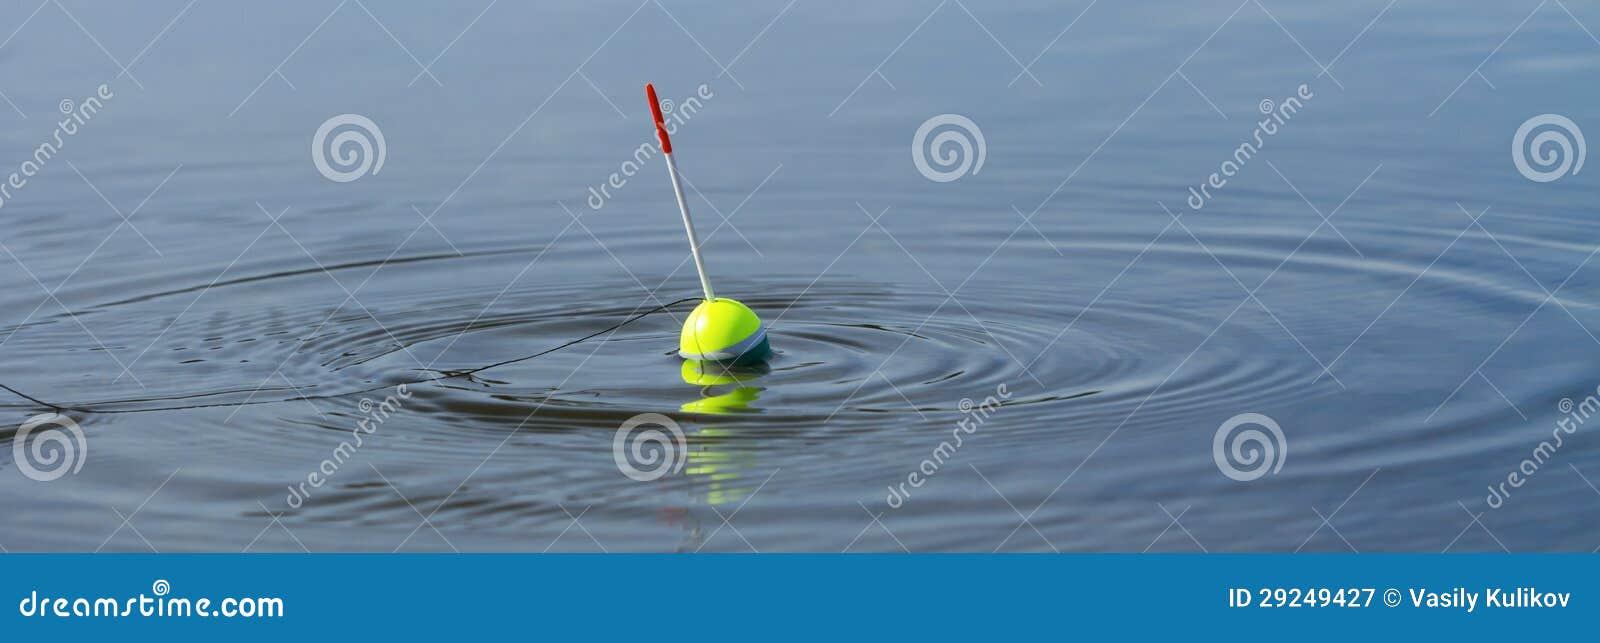 Download Mordida dos peixes imagem de stock. Imagem de flutuador - 29249427